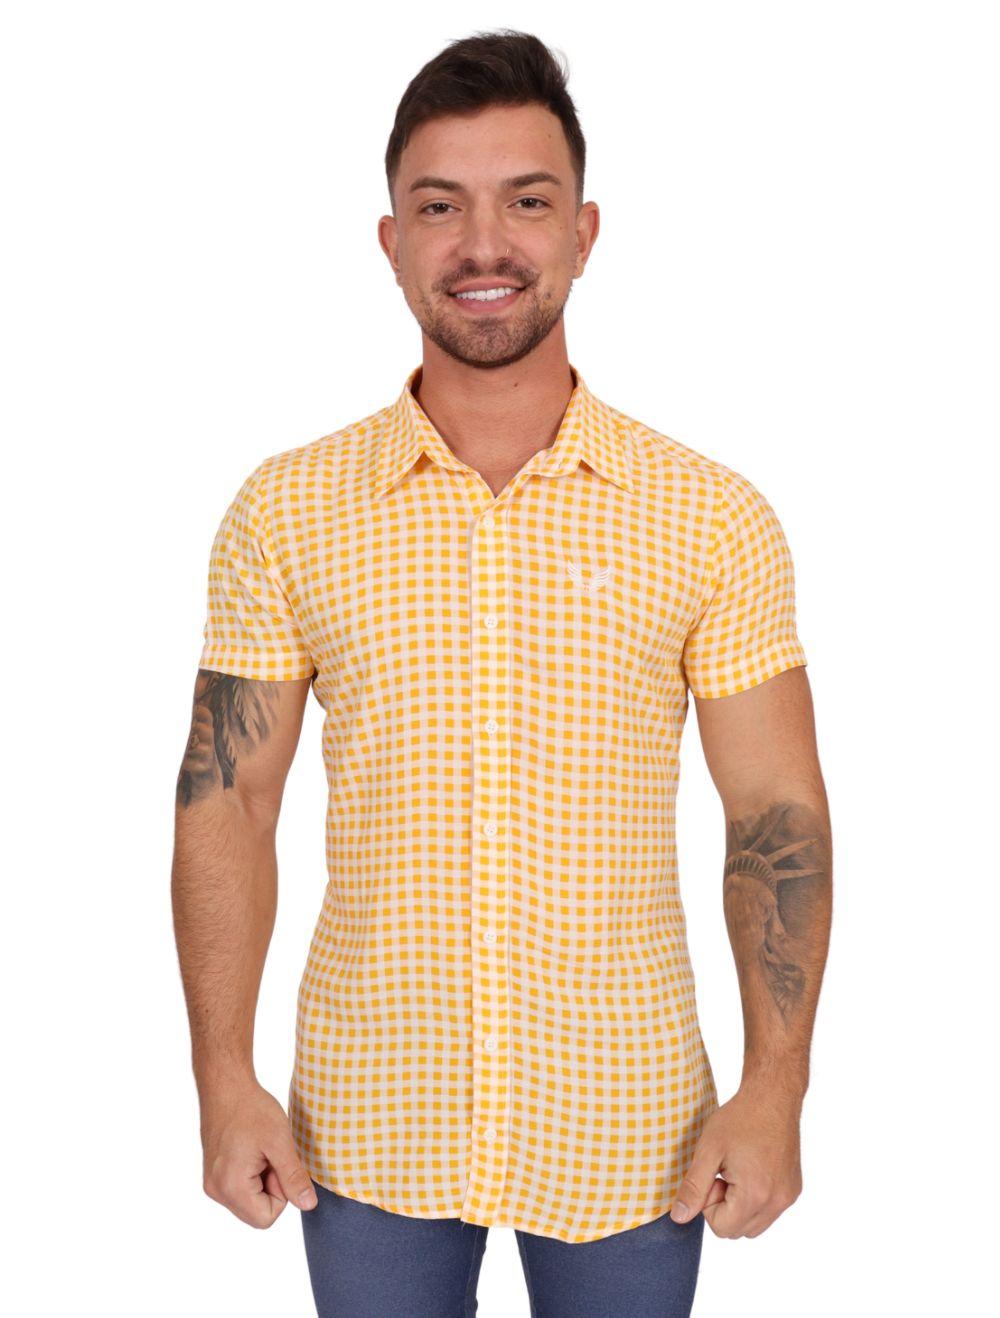 Camisa Masculina Manga Curta Xadrez Amarelo